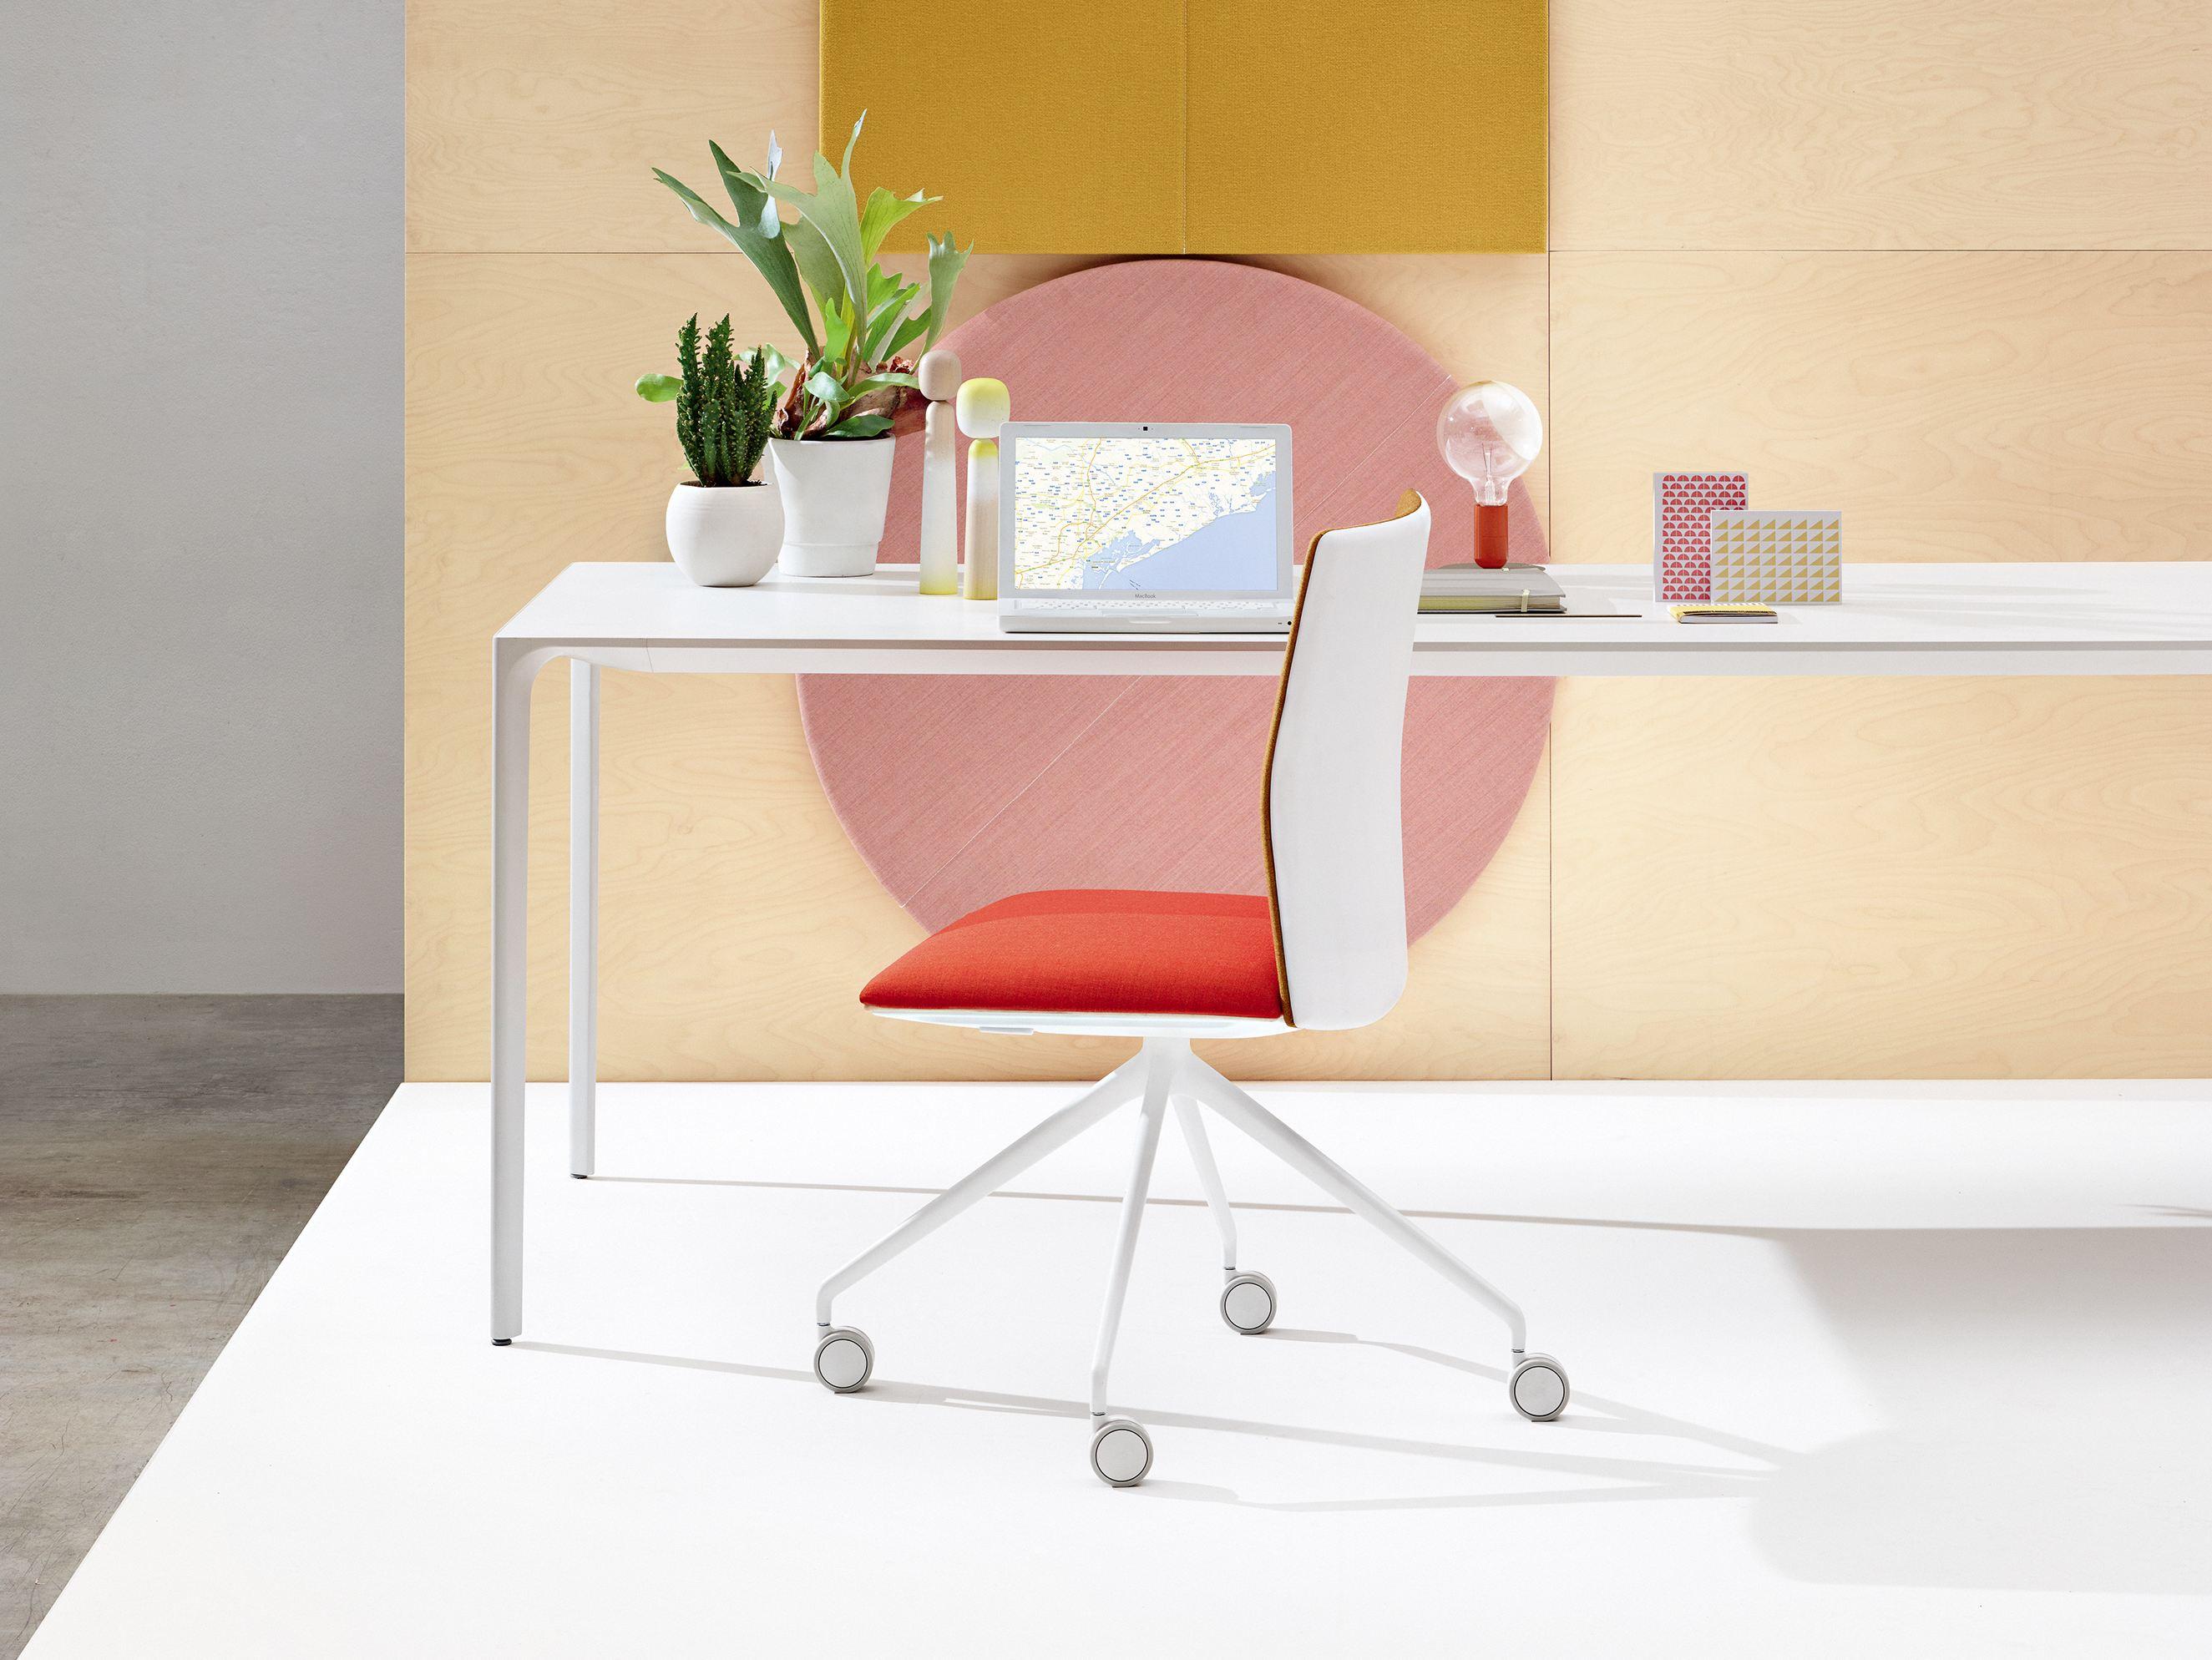 Kinesit Office Chair by Arper